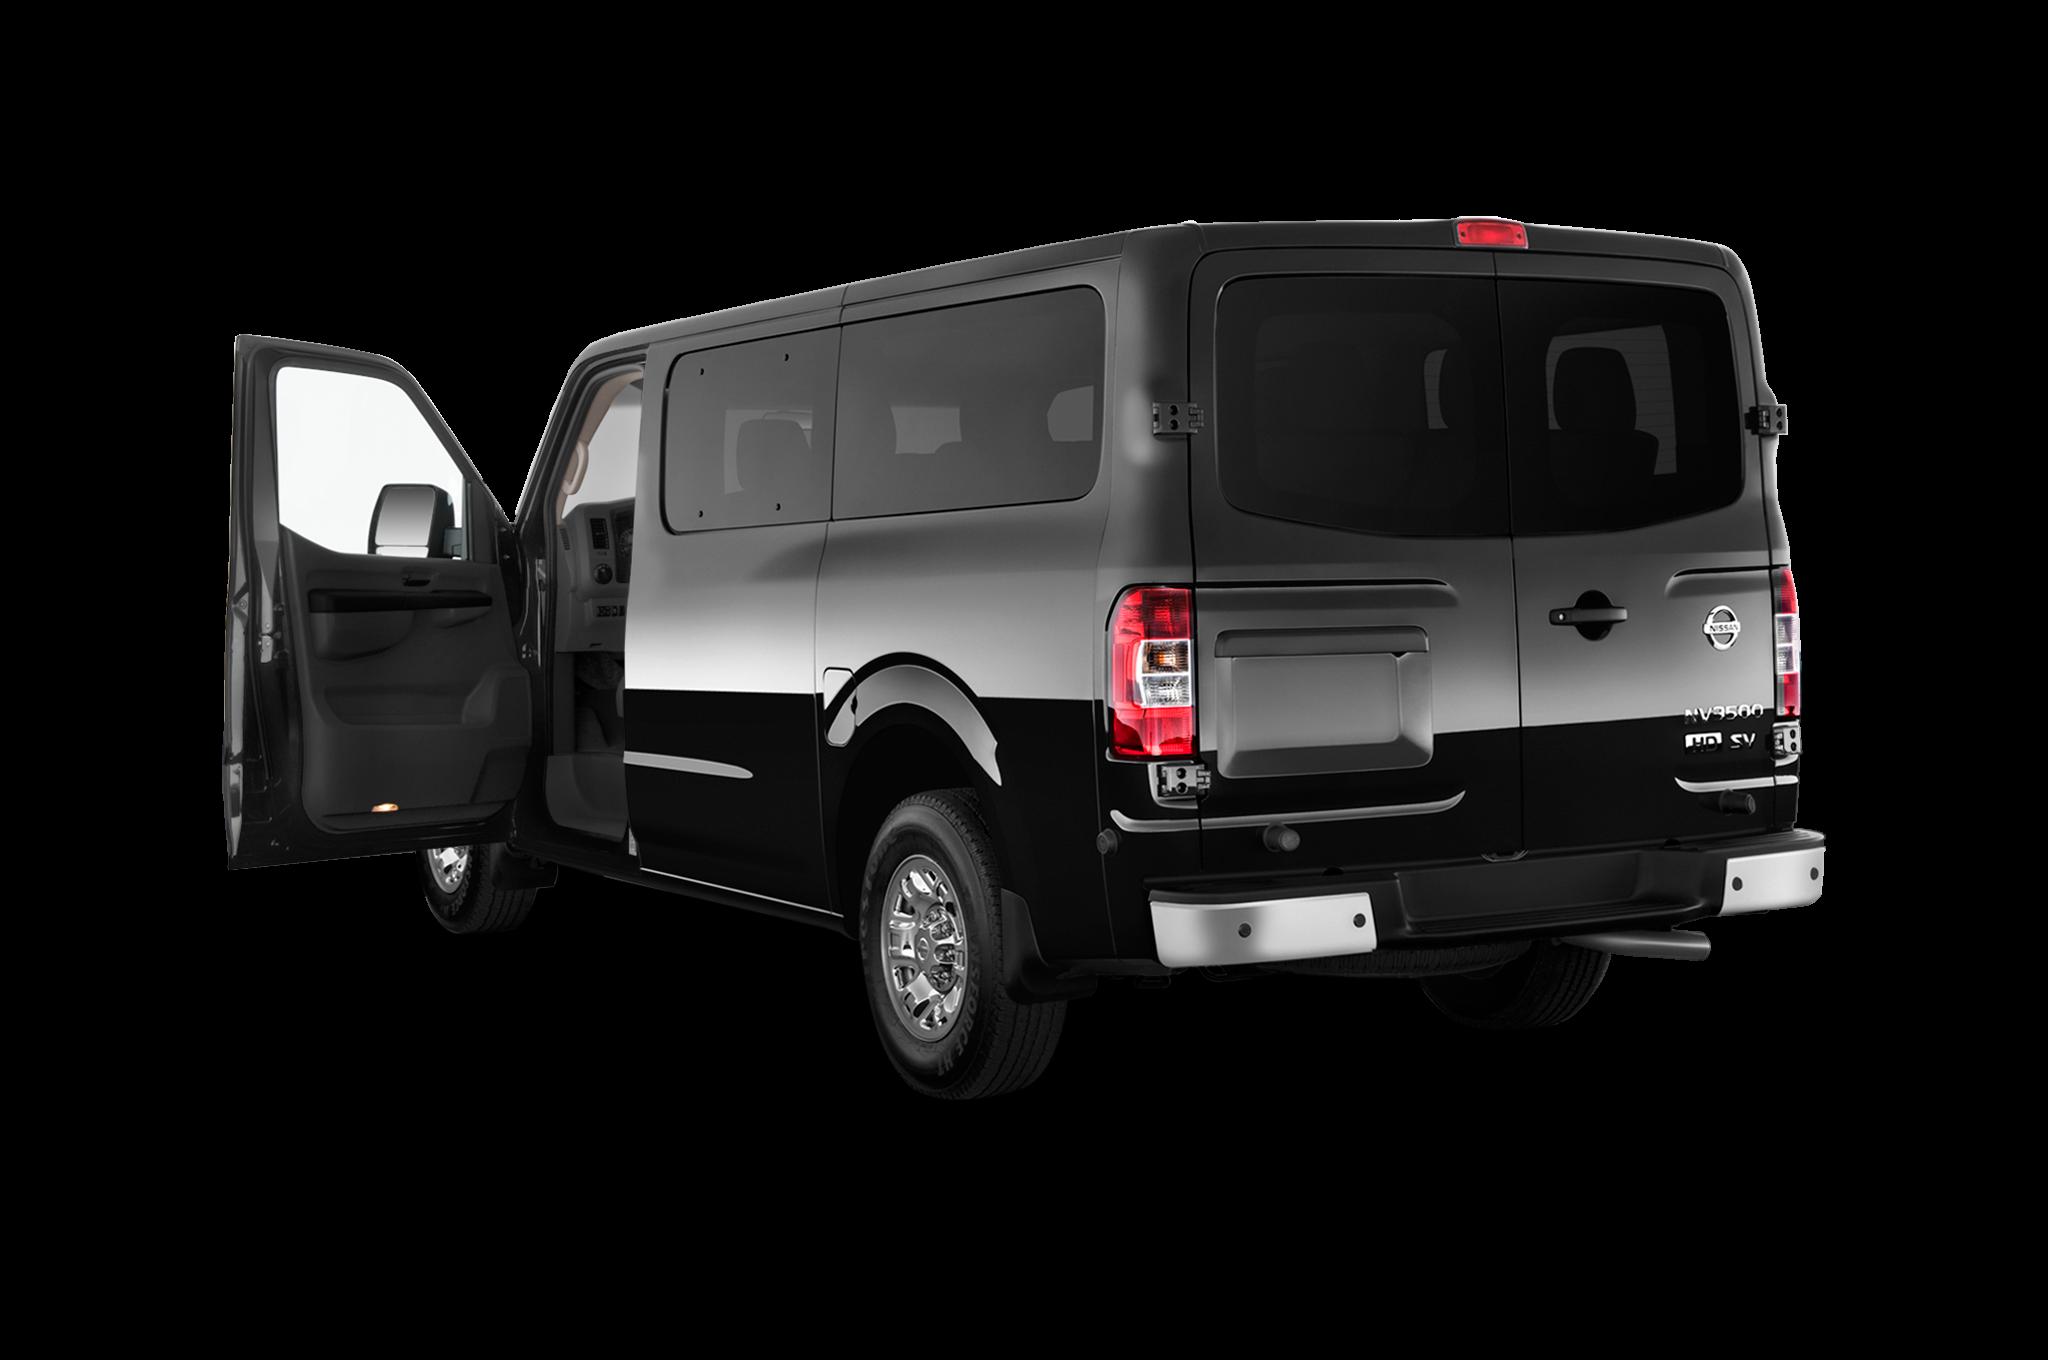 Nissan NV PASSENGER 3500 SV V8 2014 International Price & Overview